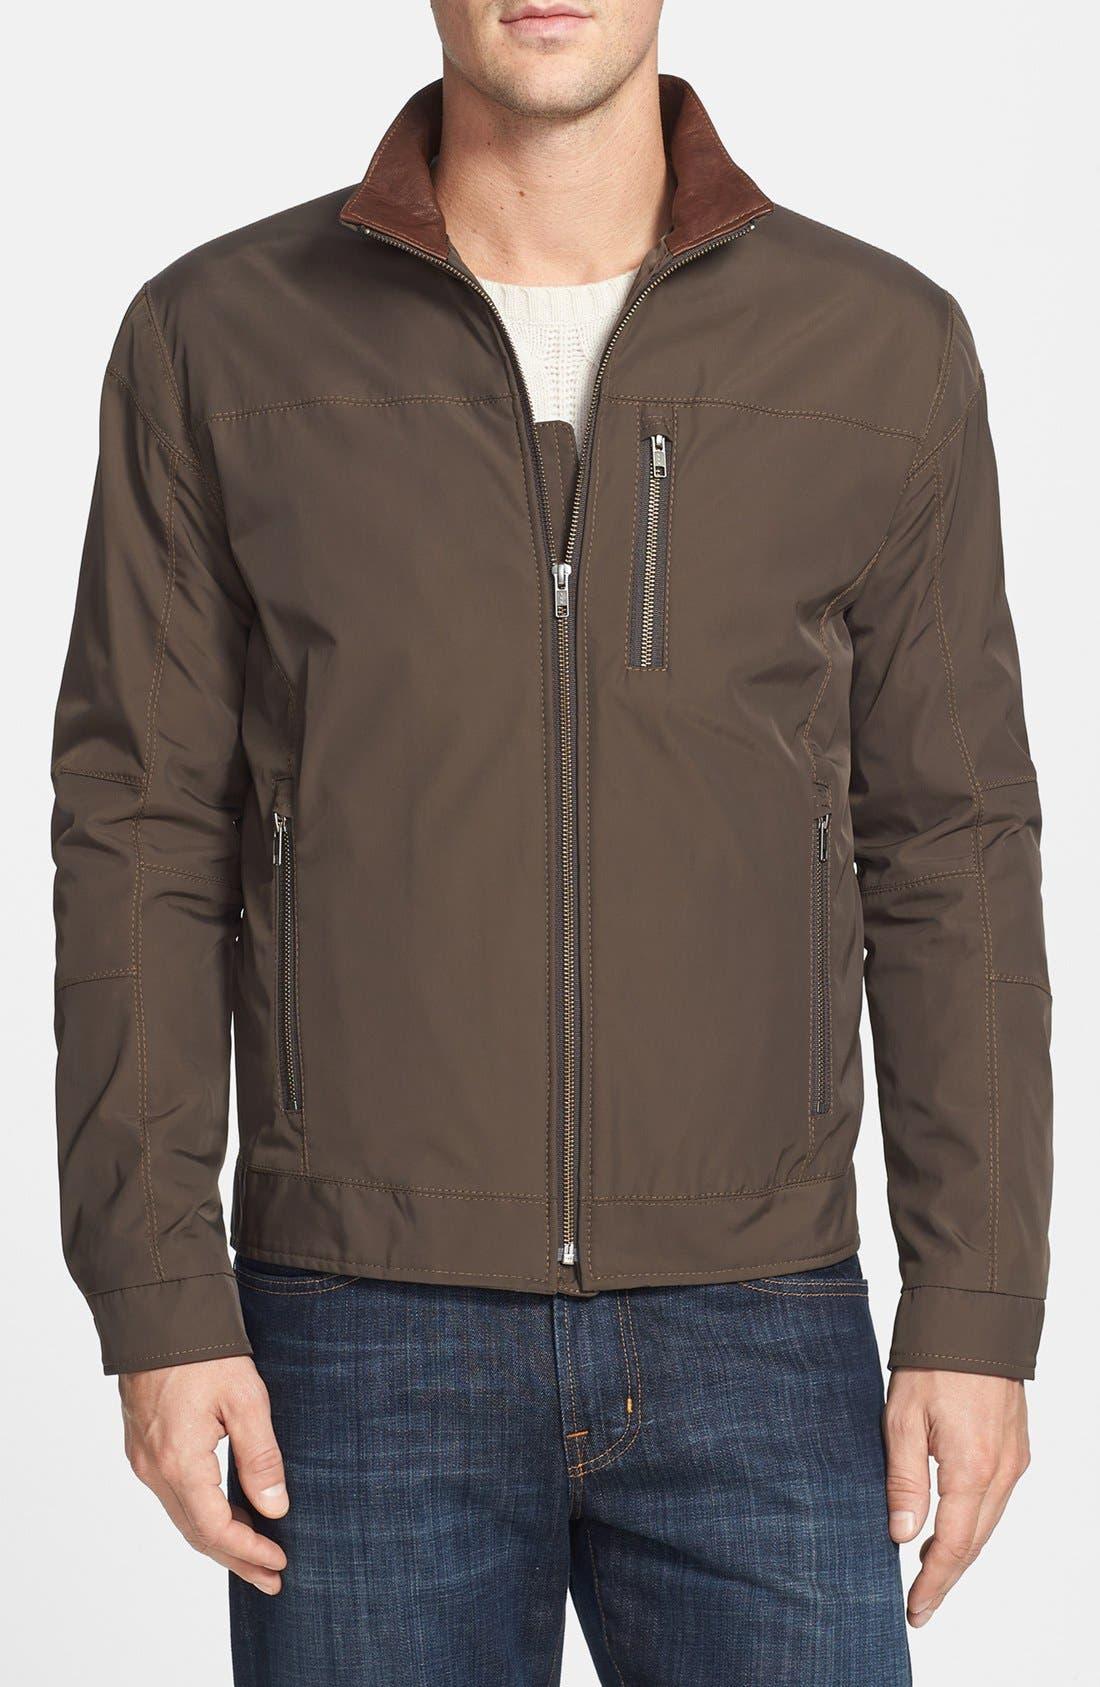 Remy Leather 'Hi Density' Jacket